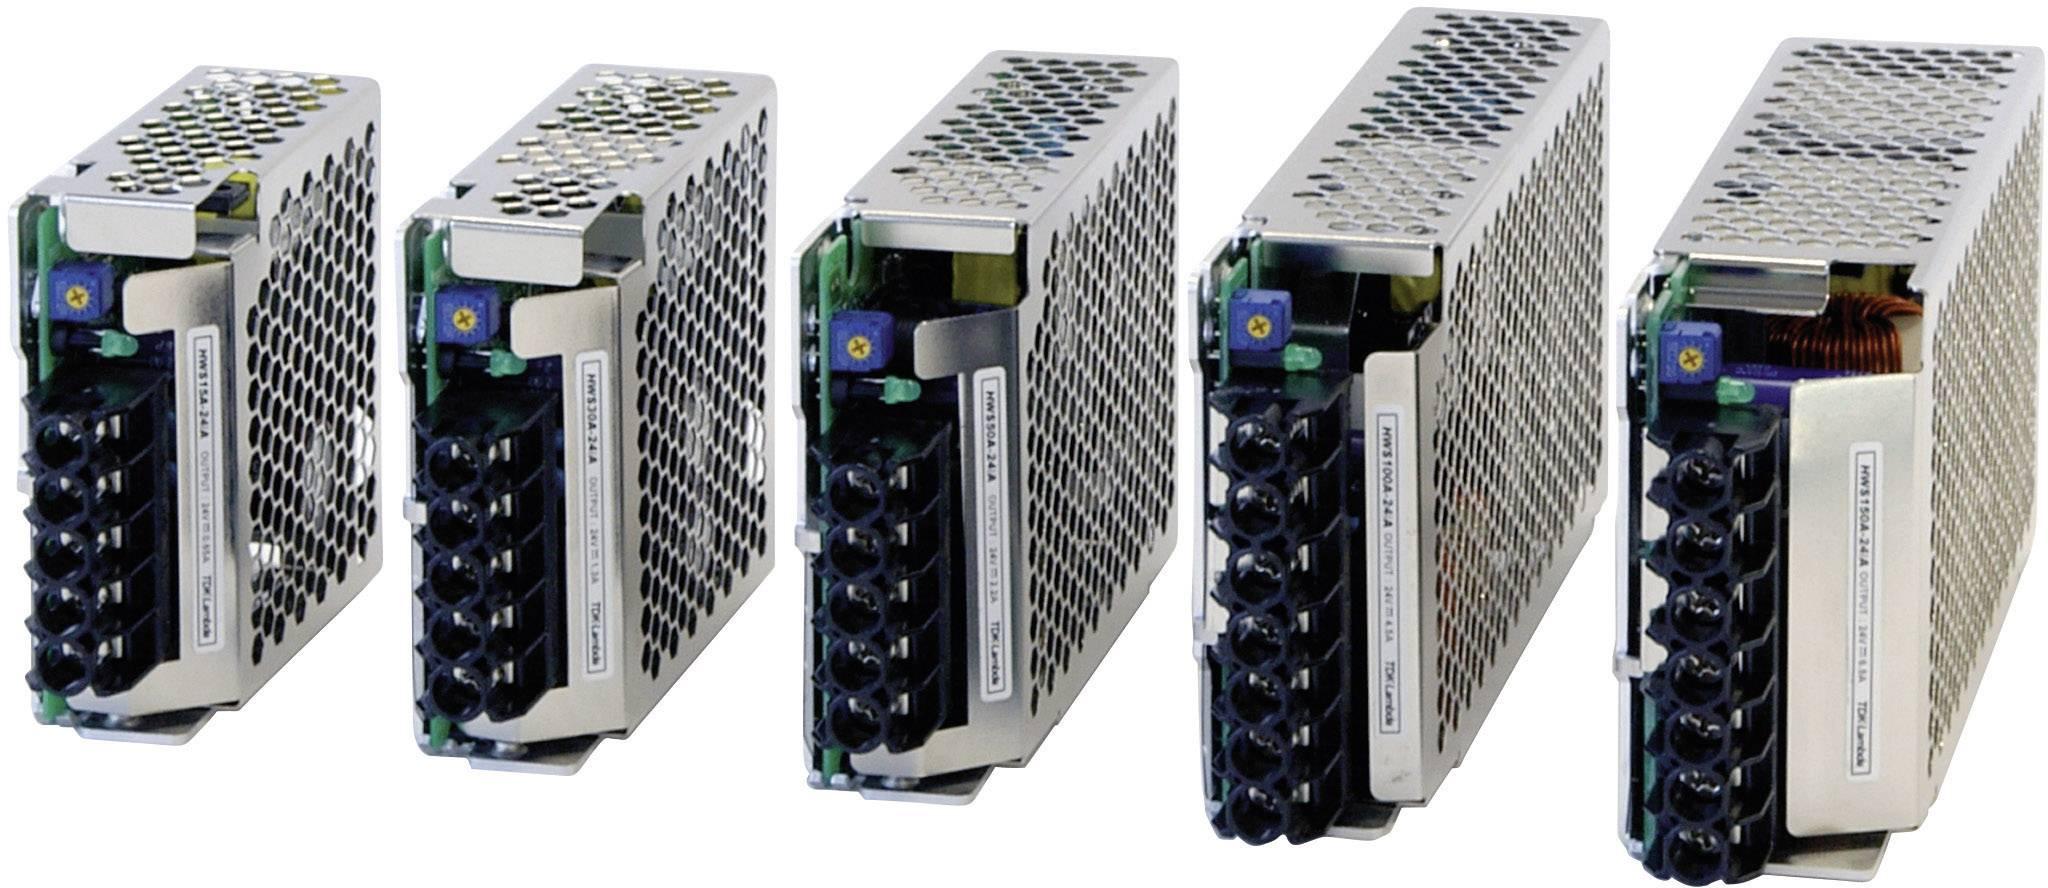 Zabudovateľný napájací zdroj TDK-Lambda HWS-150A-48/A, 48 V, 158,4 W